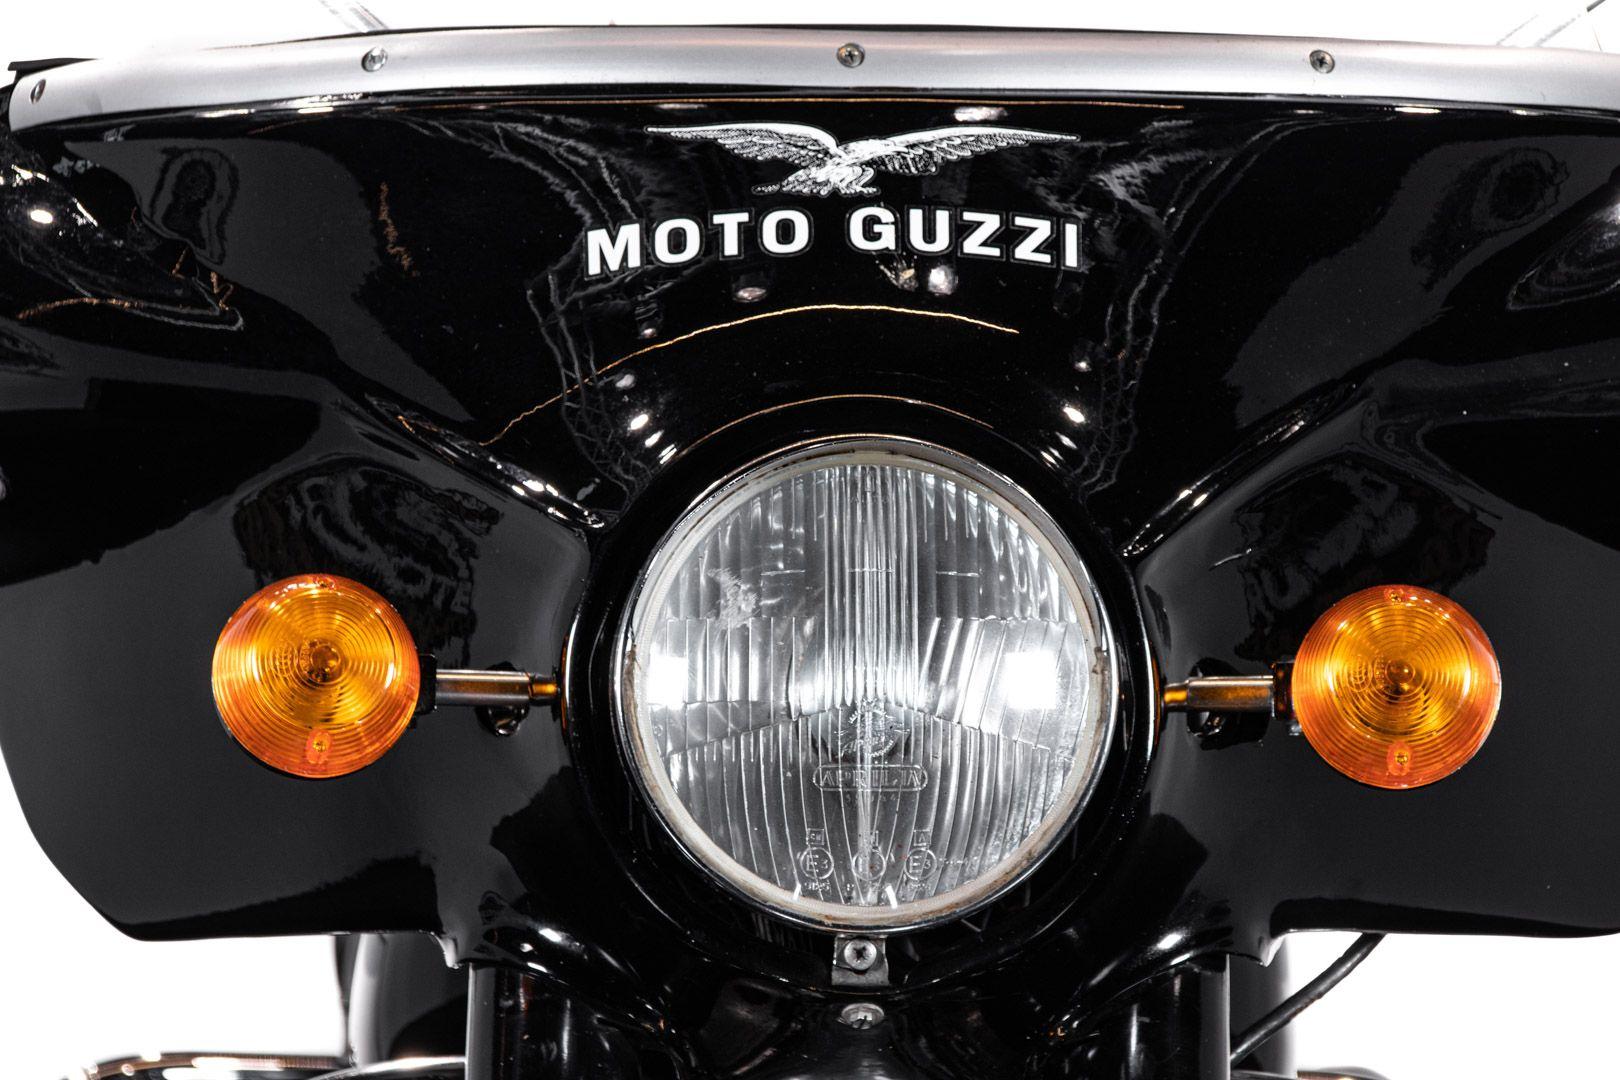 1969 Moto Guzzi V7 Special 81481